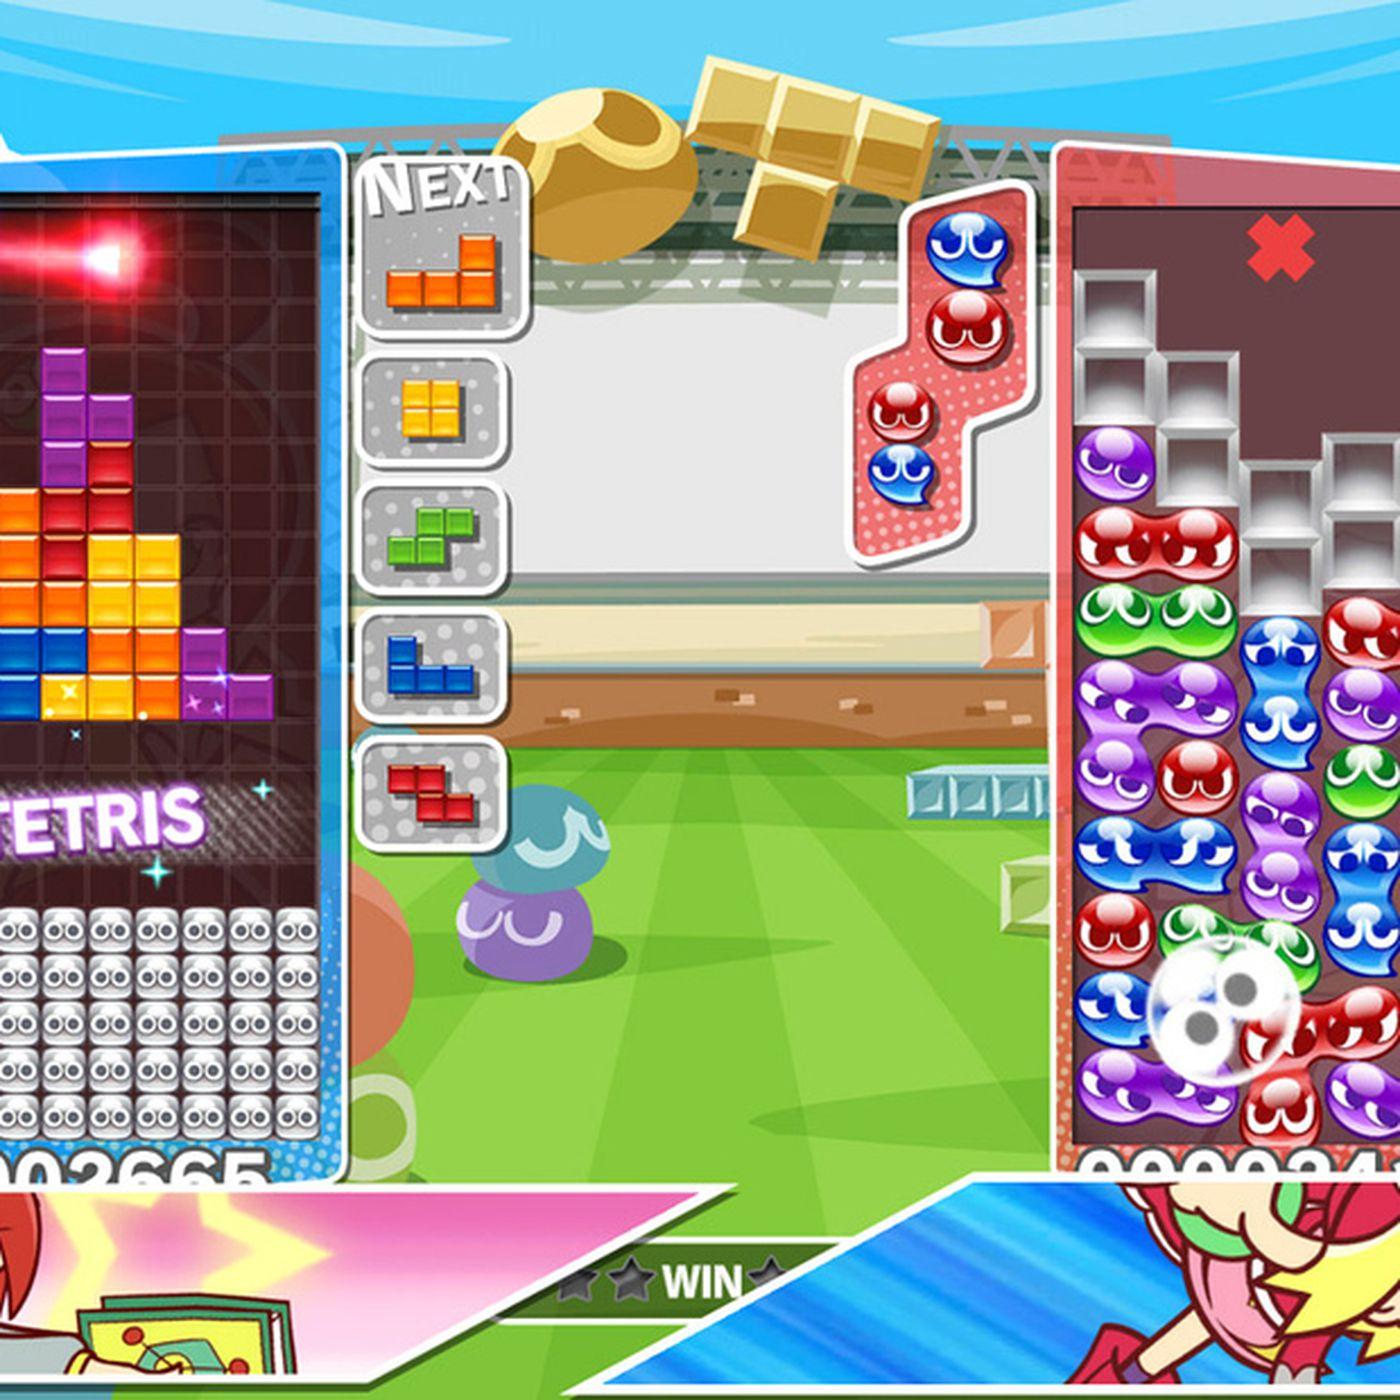 puyo puyo tetris s physical nintendo switch version costs 10 more